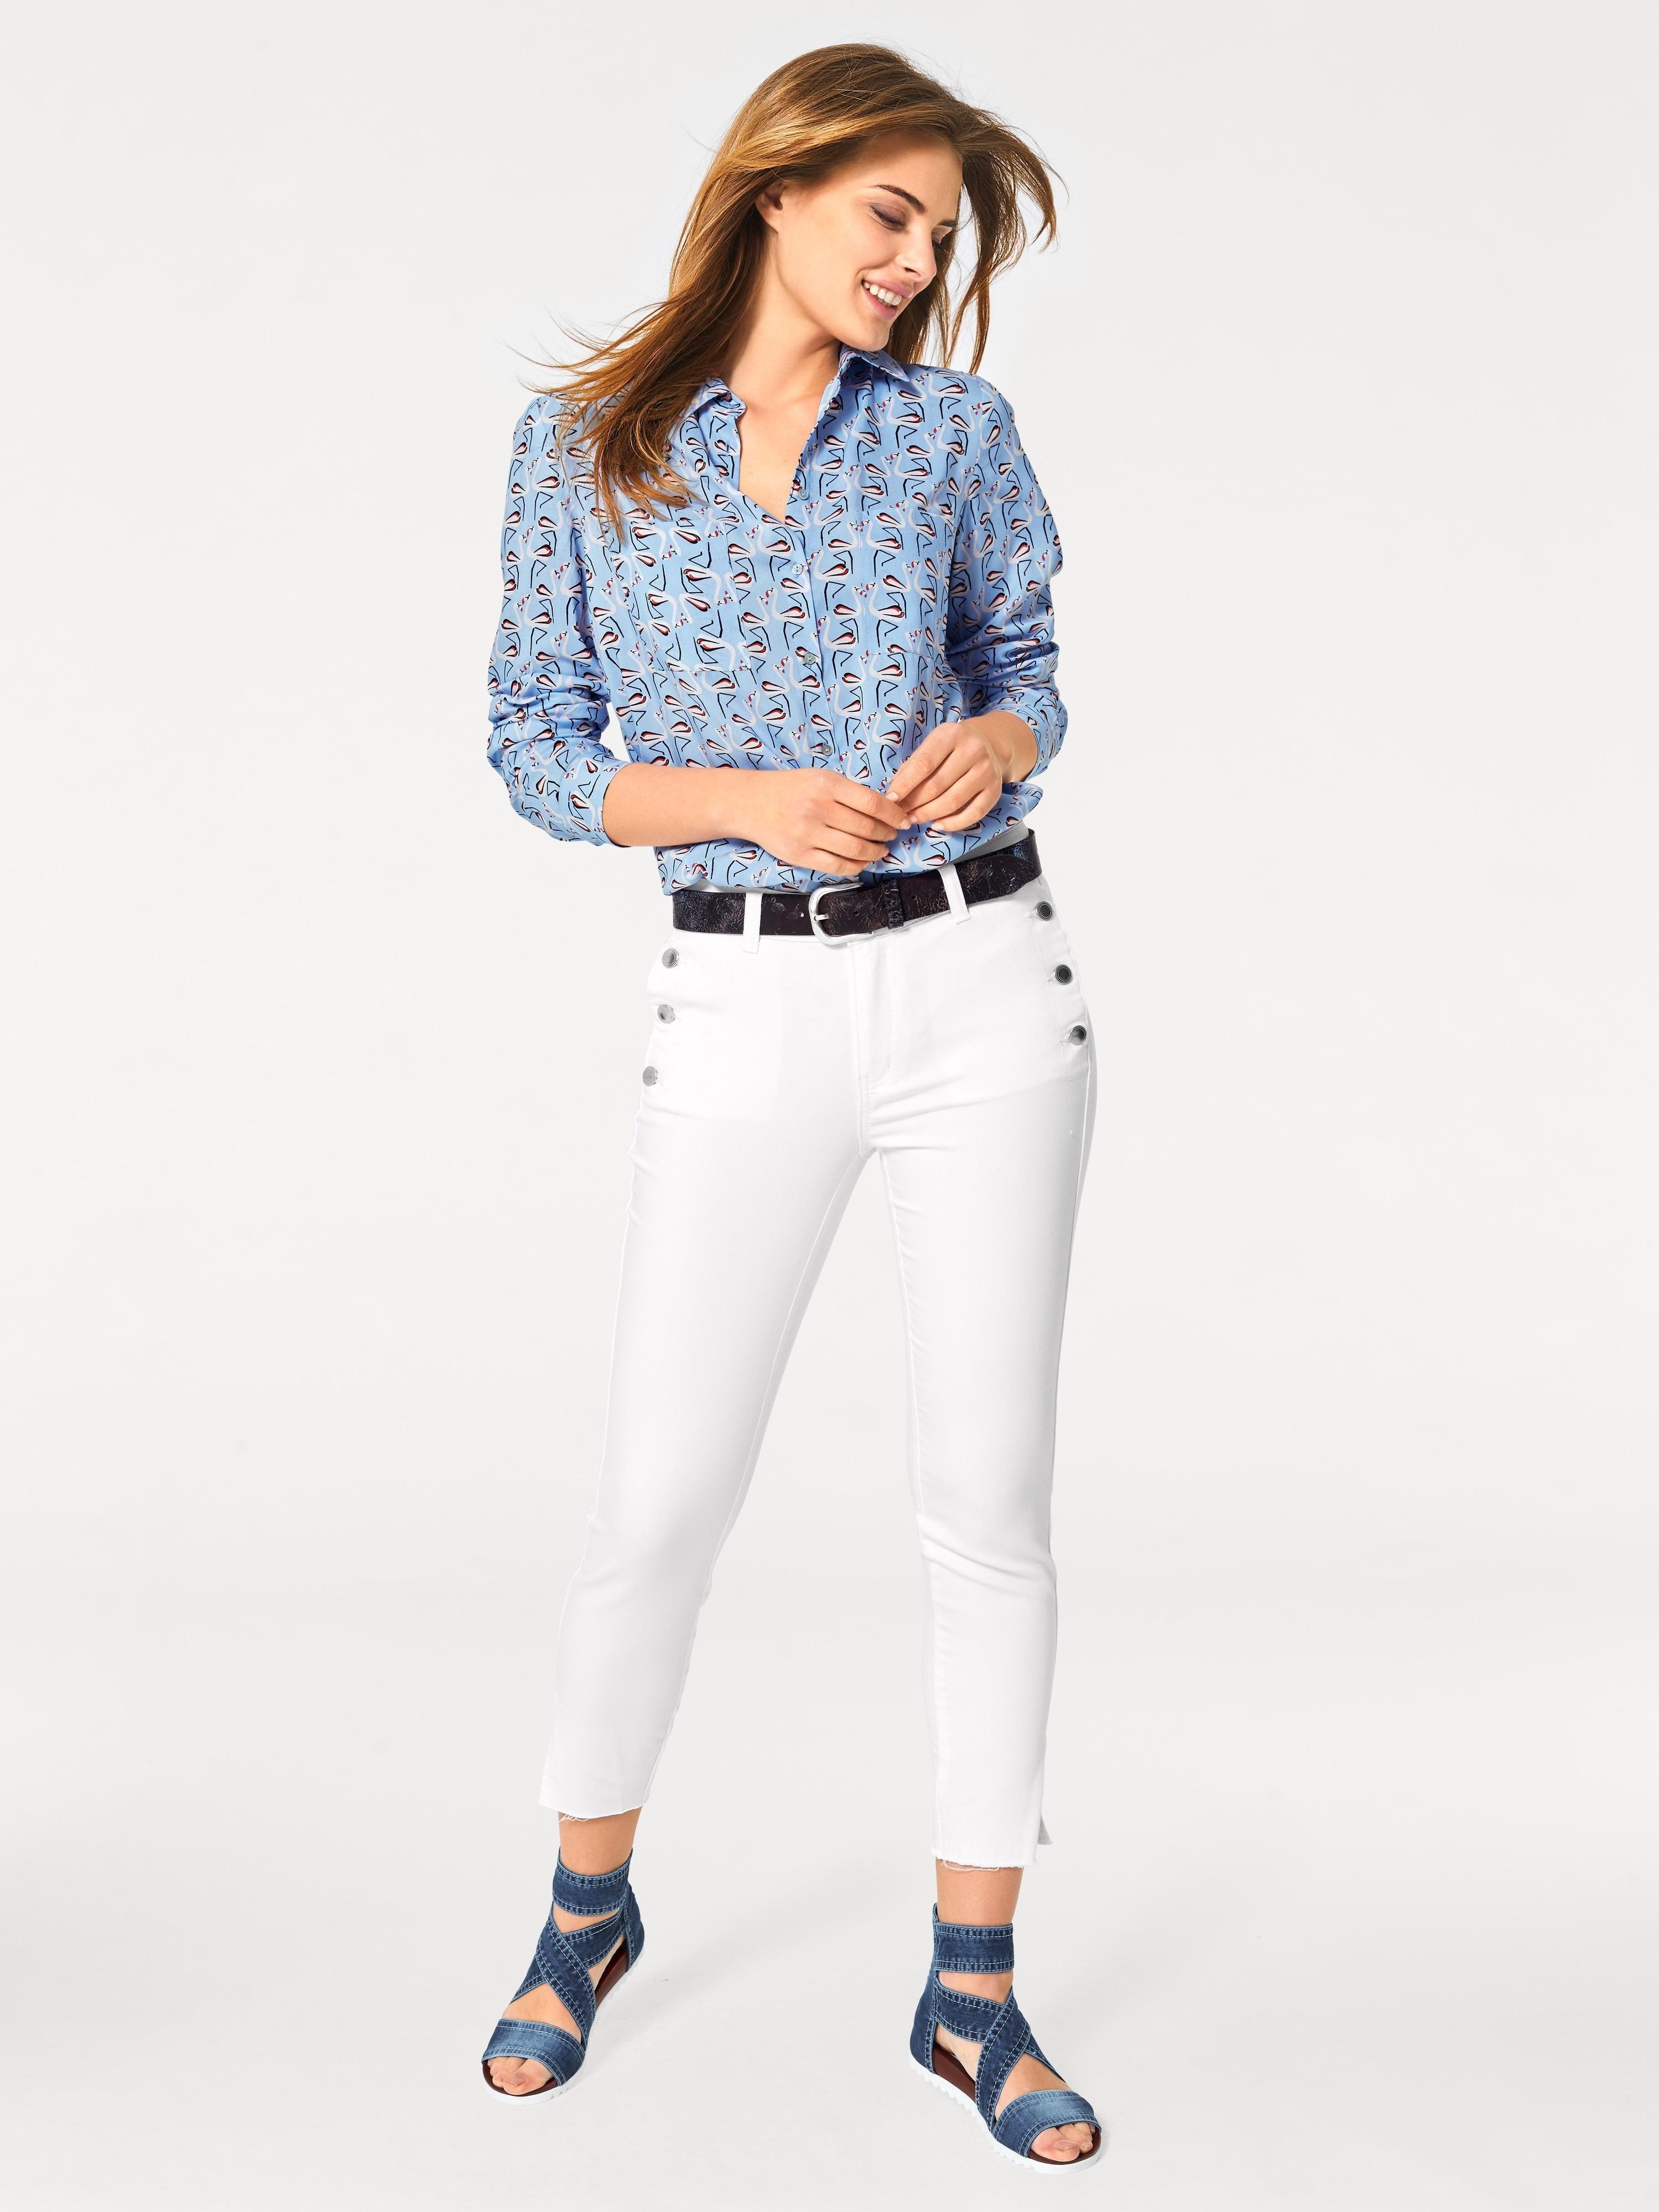 Online Bestellen Bestellen Online Jeans Jeans Bestellen Jeans Online Online Jeans b6gyvYf7